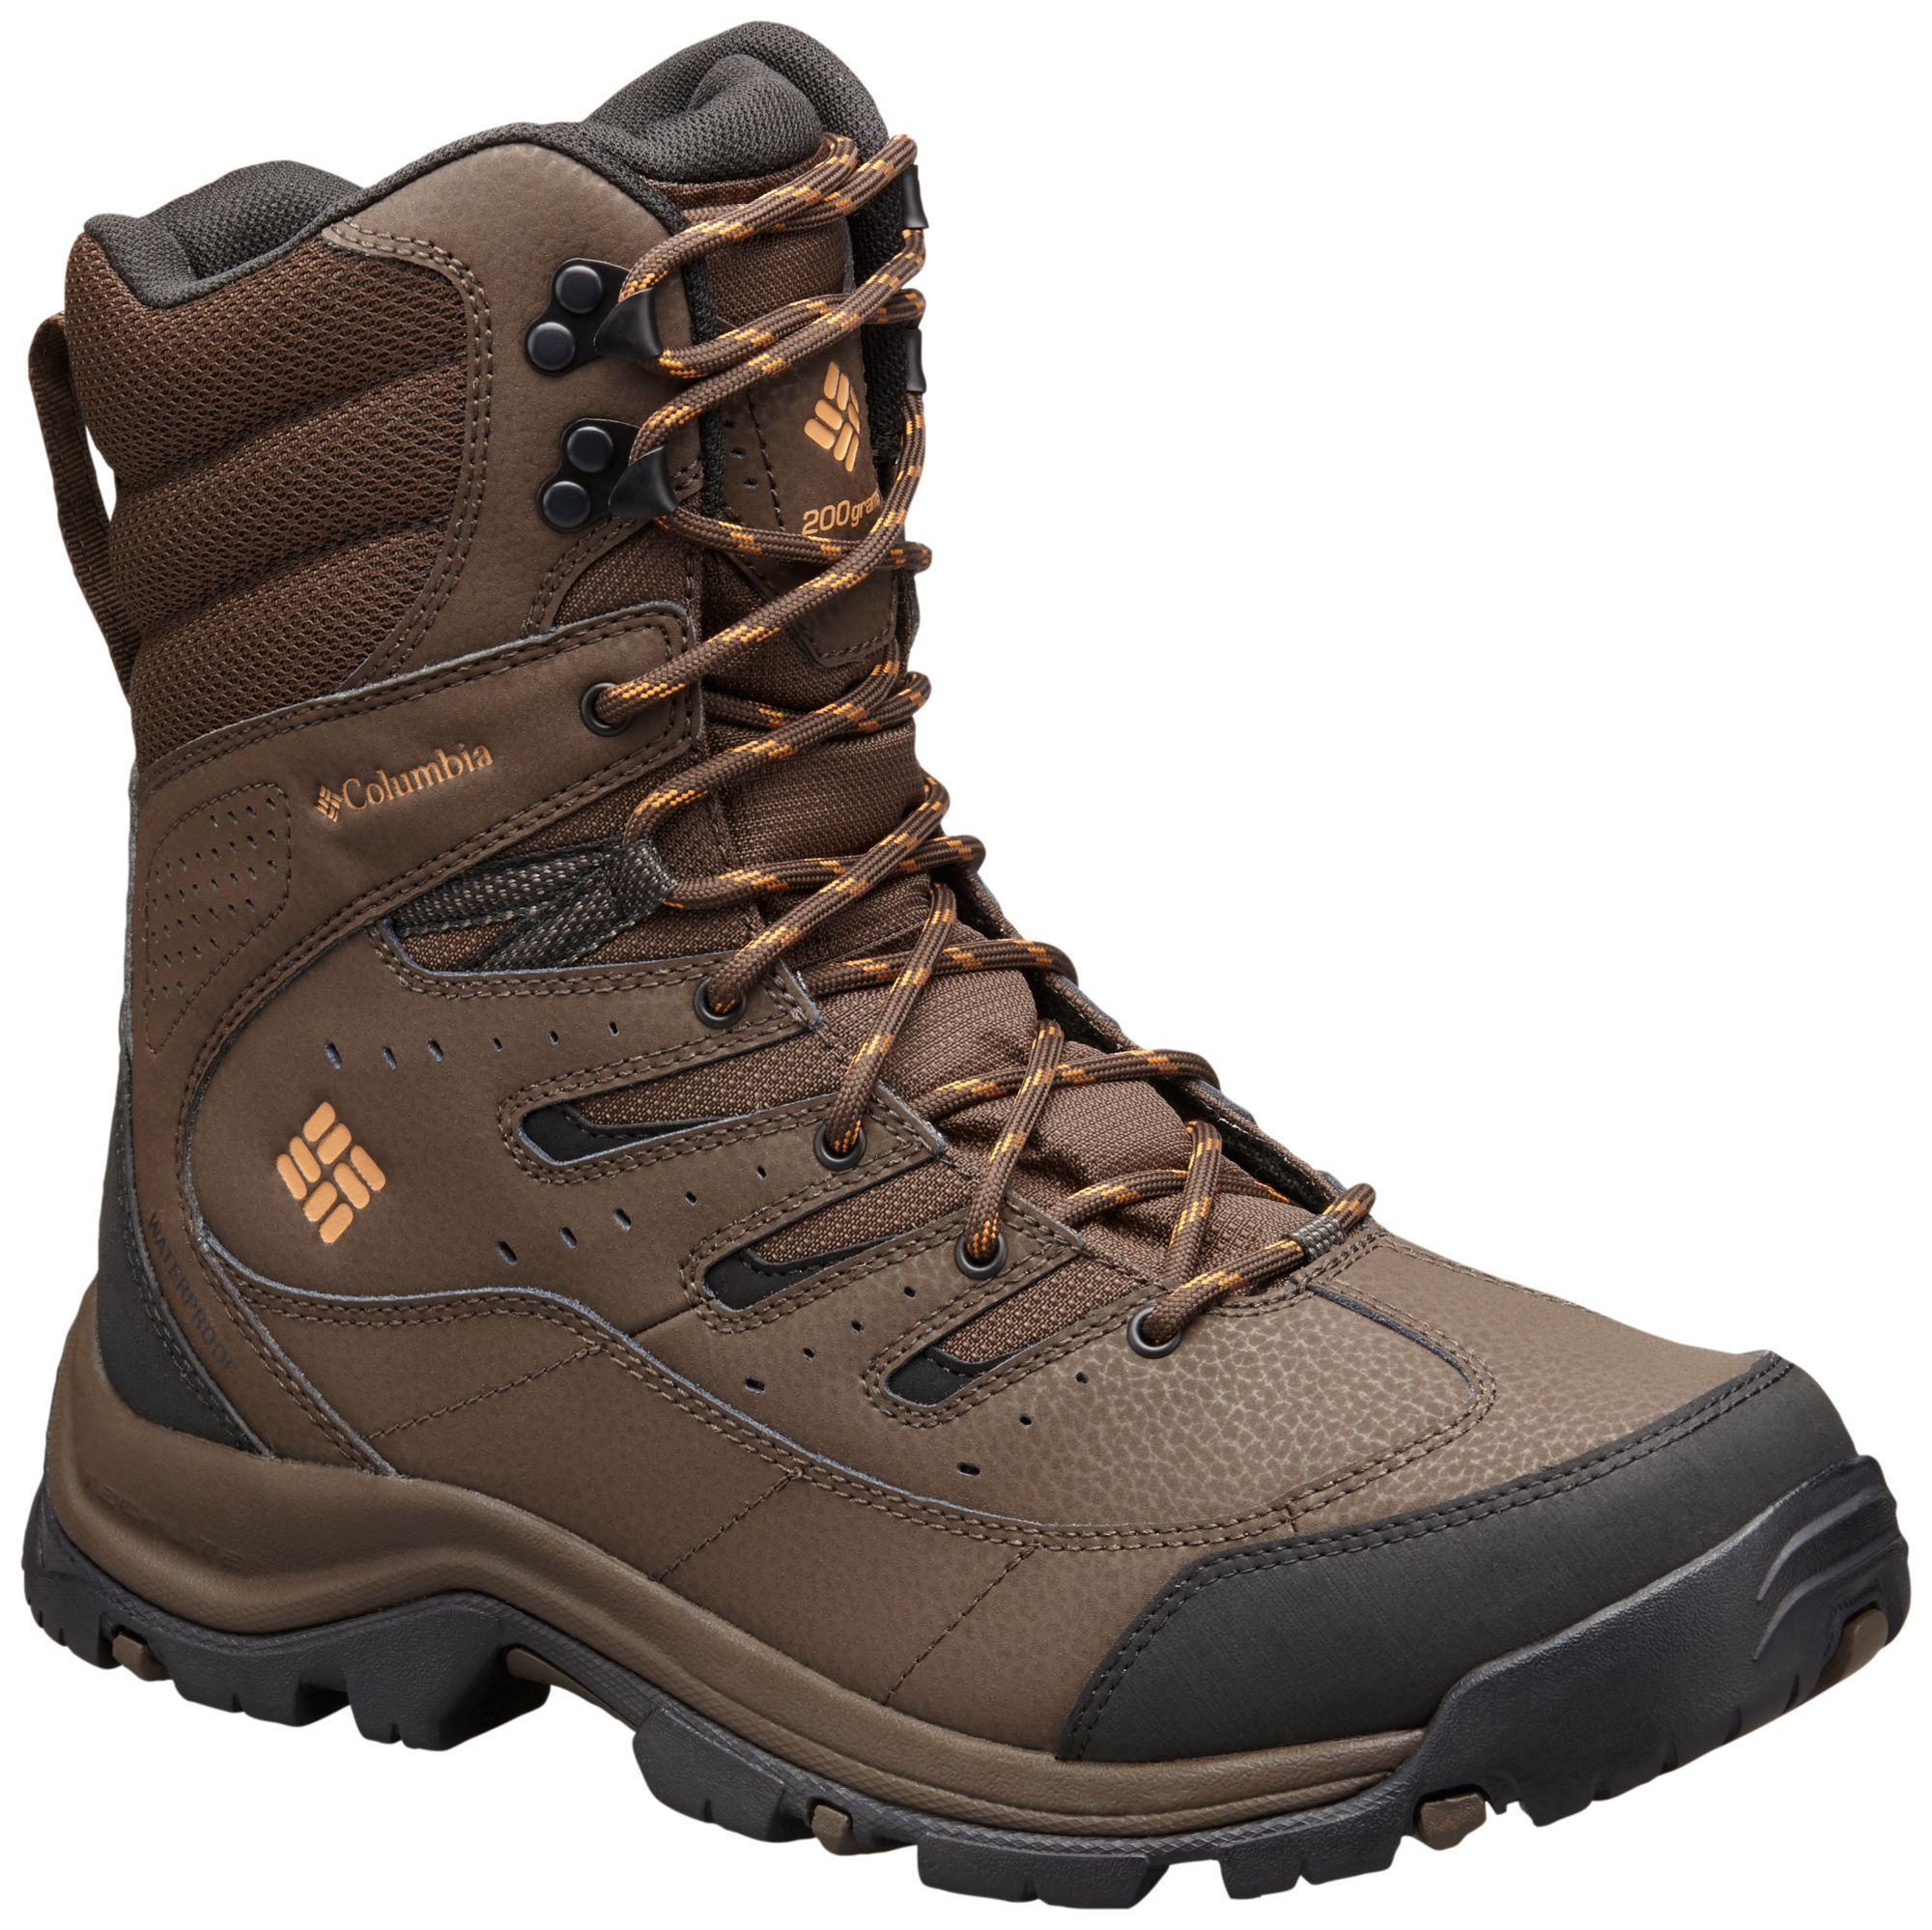 ae0773cd961 Lyst - Columbia Gunnison Plus 200g Waterproof Winter Boots in Brown ...